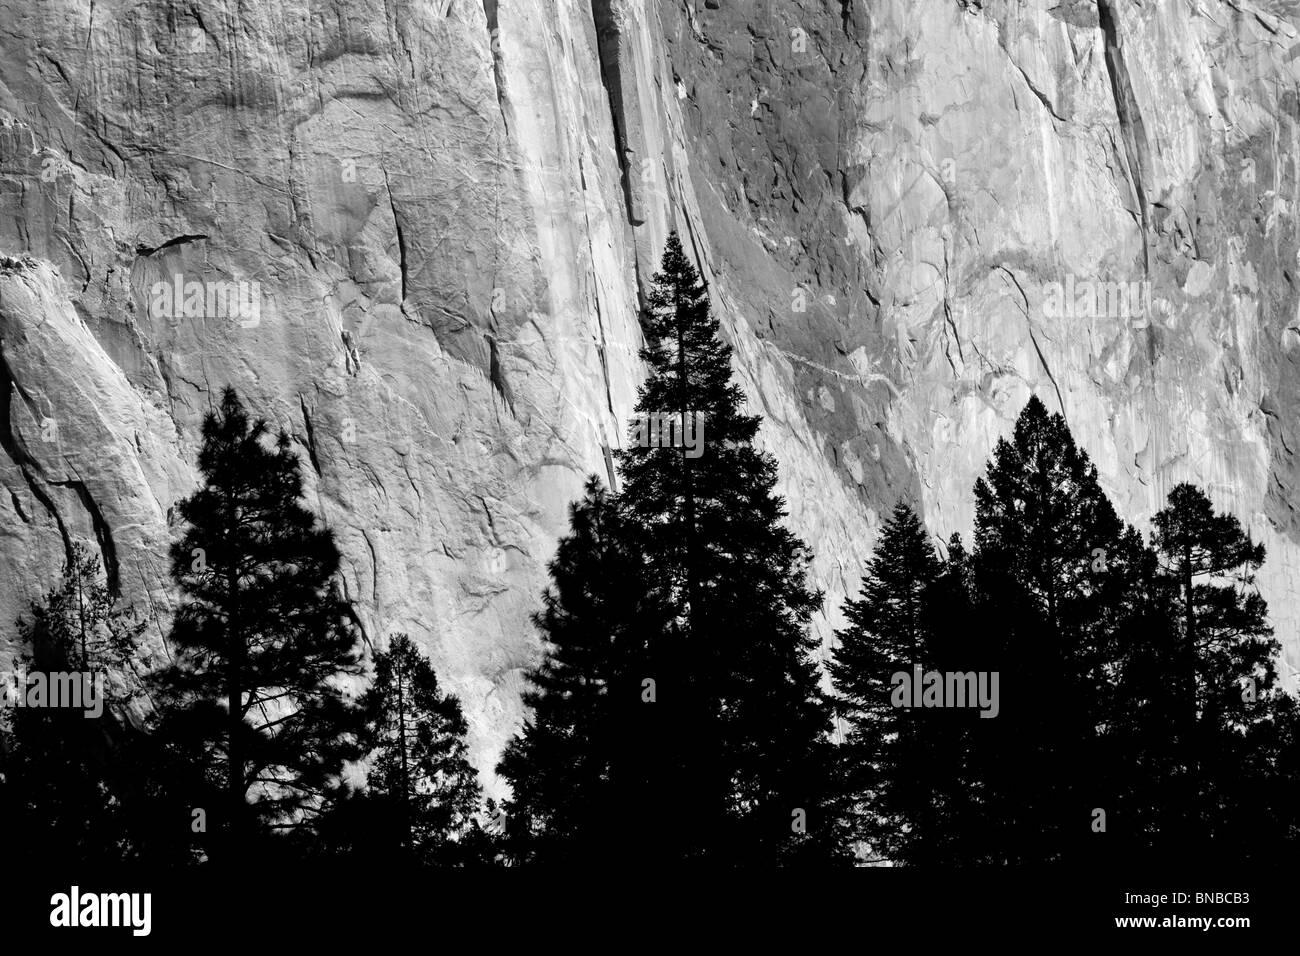 El Capitan mit Silhouette Bäume. Yosemite Nationalpark, Kalifornien Stockbild